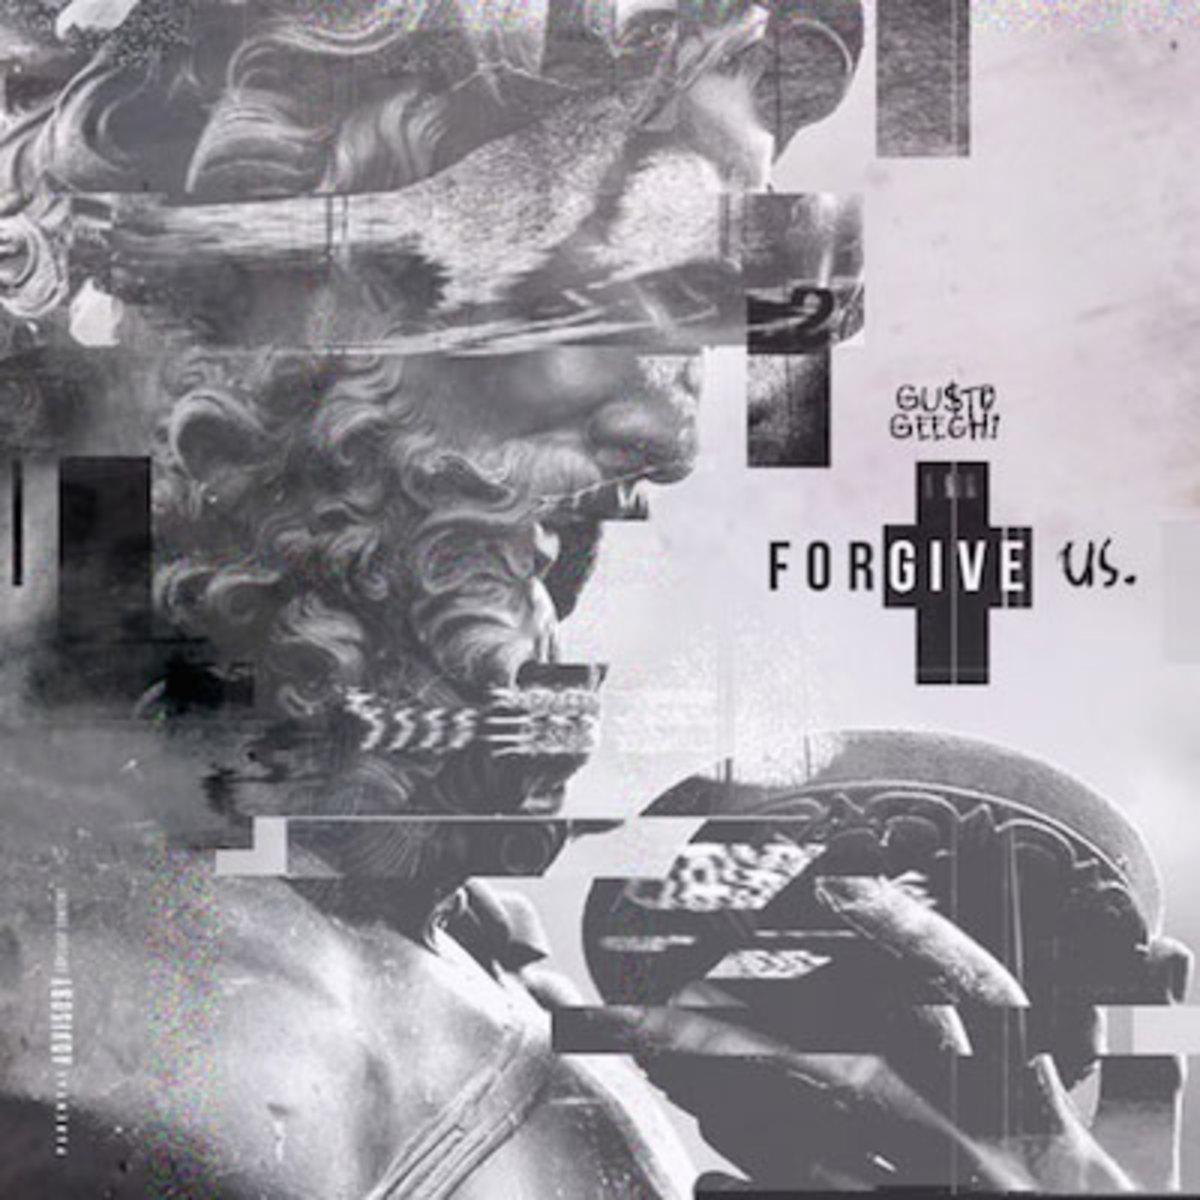 gusto-geechi-forgive-us.jpg